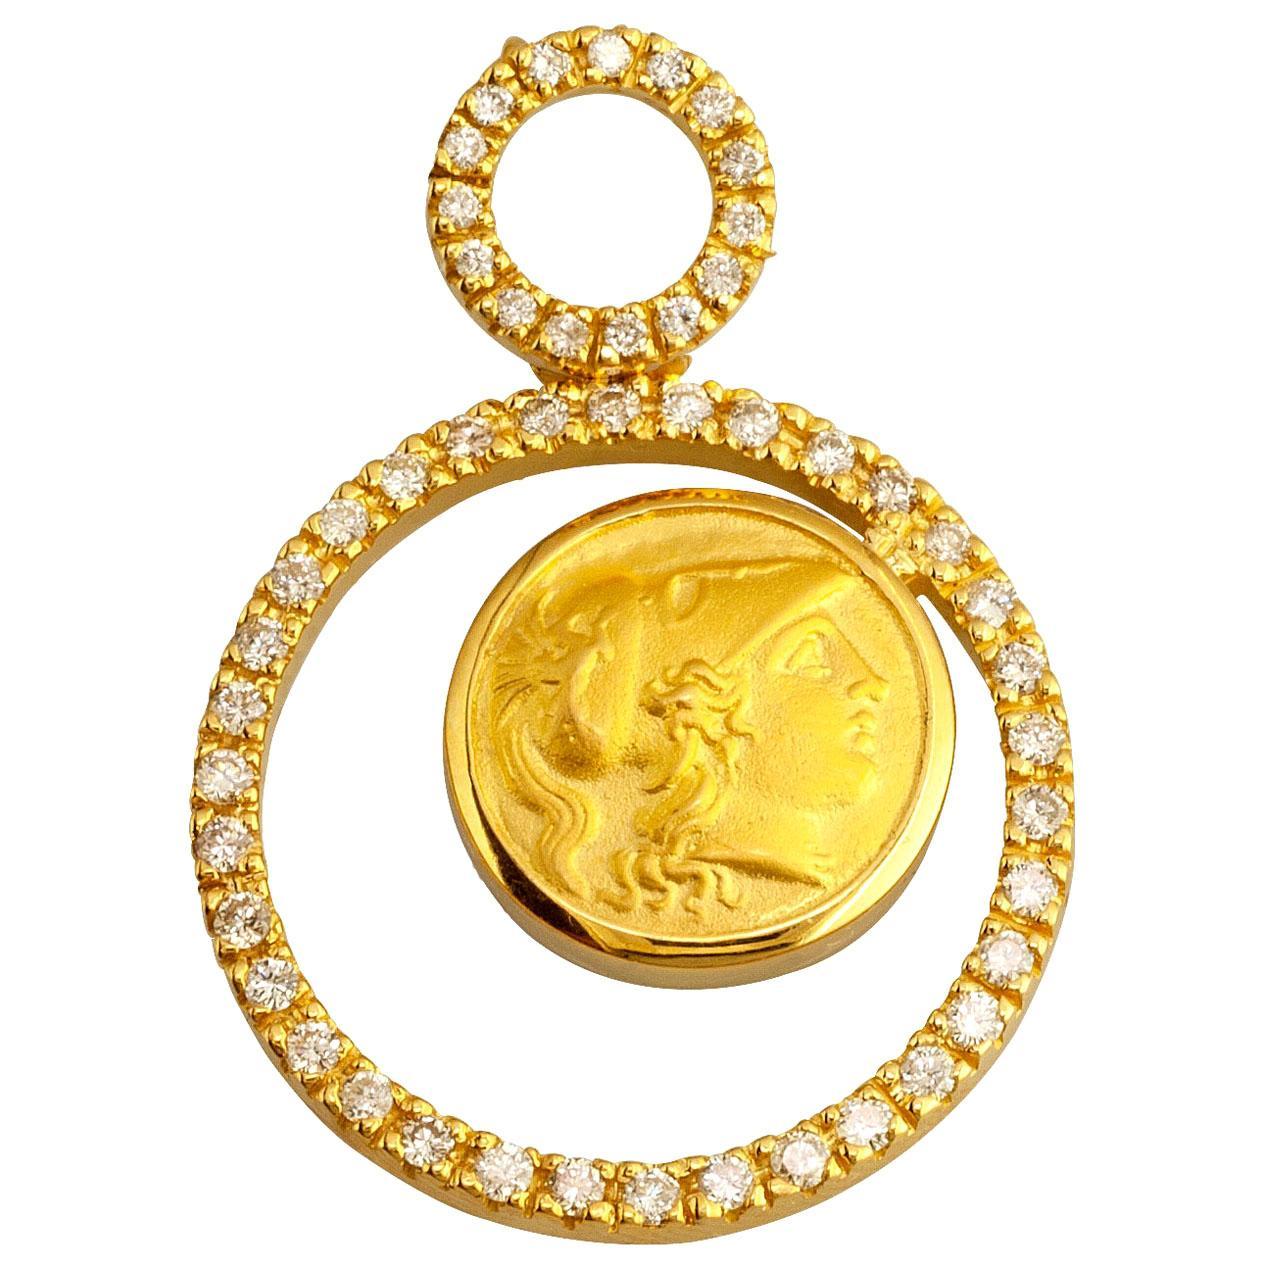 Georgios Collections 18 Karat Yellow Gold Diamonds Athena Coin Pendant Necklace